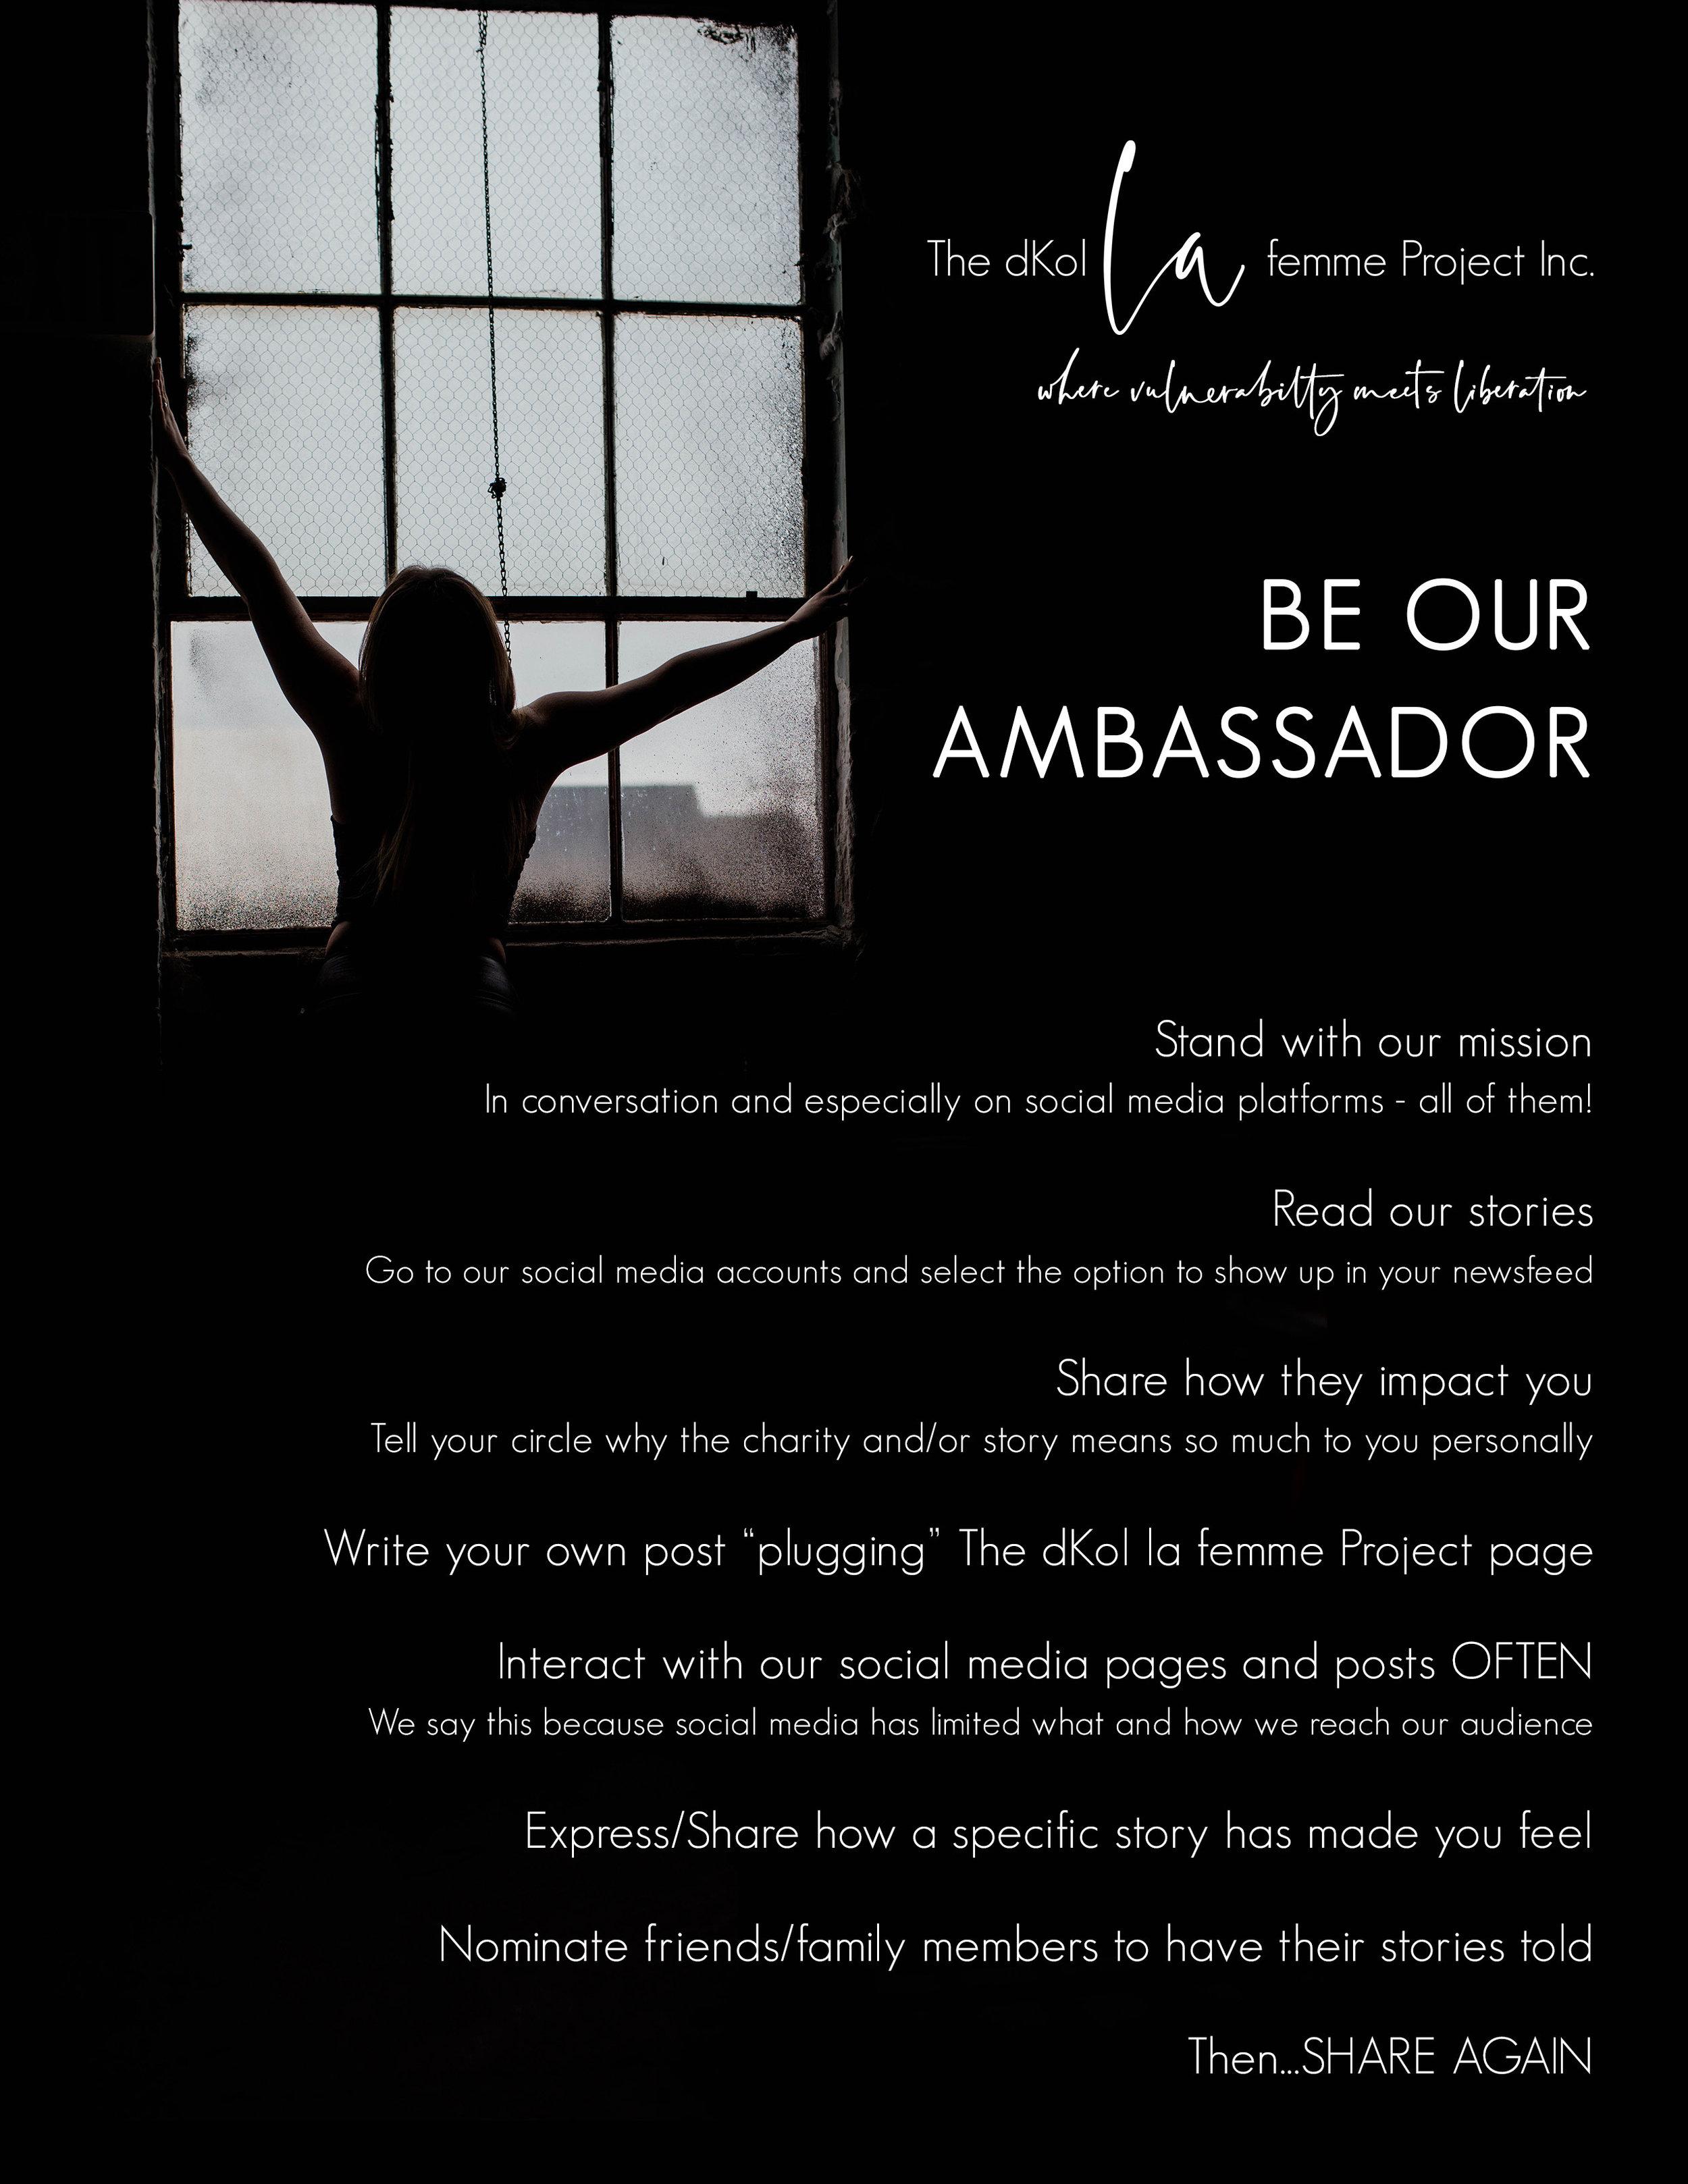 be our dkol ambassador